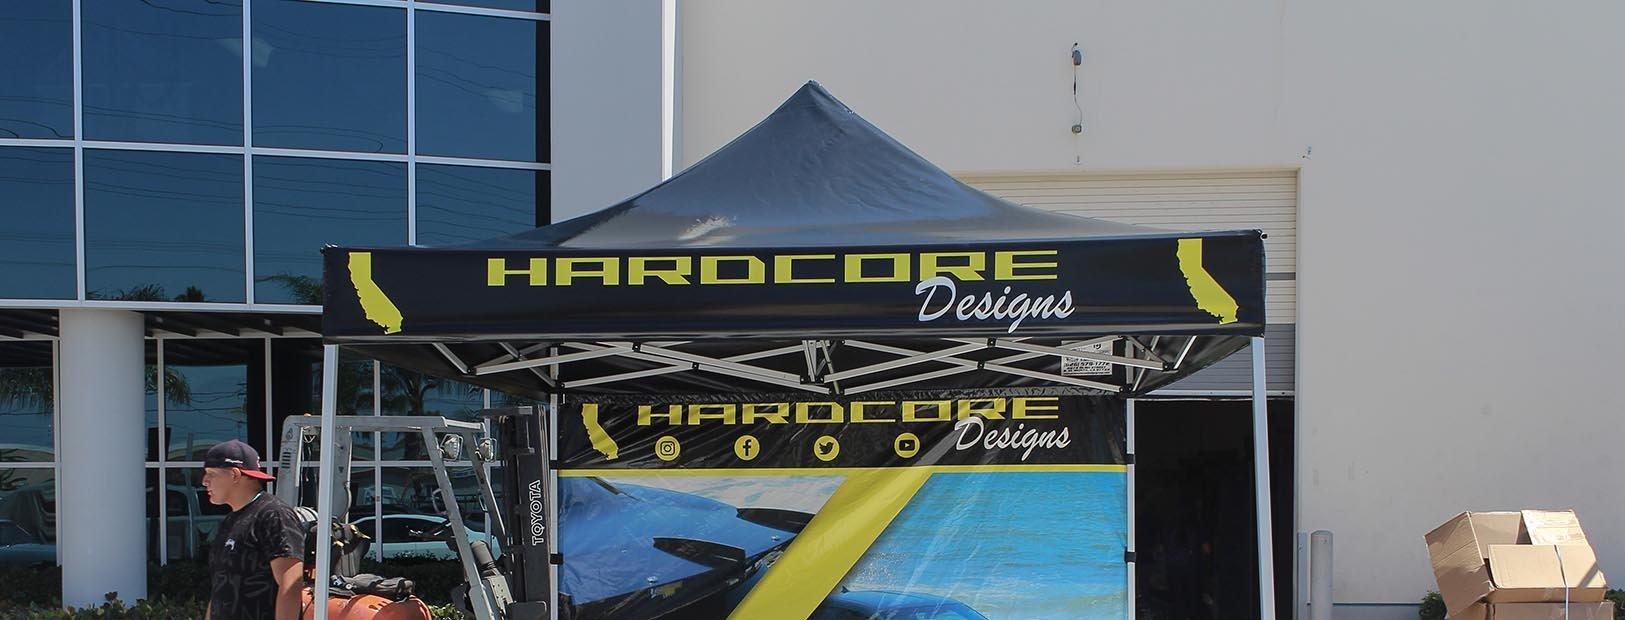 hardcore-designs-header.jpg